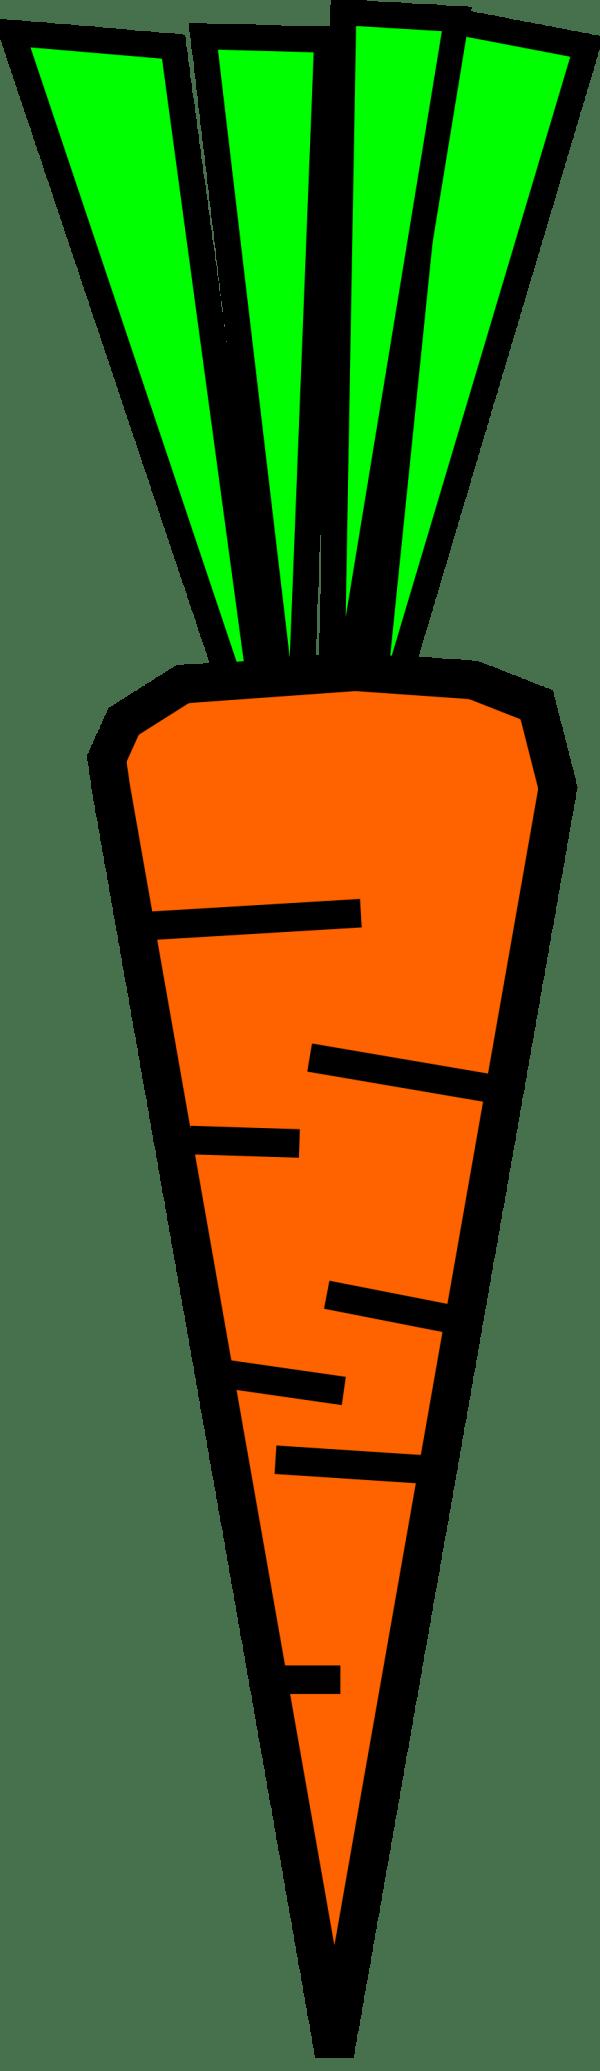 carrot free stock illustration